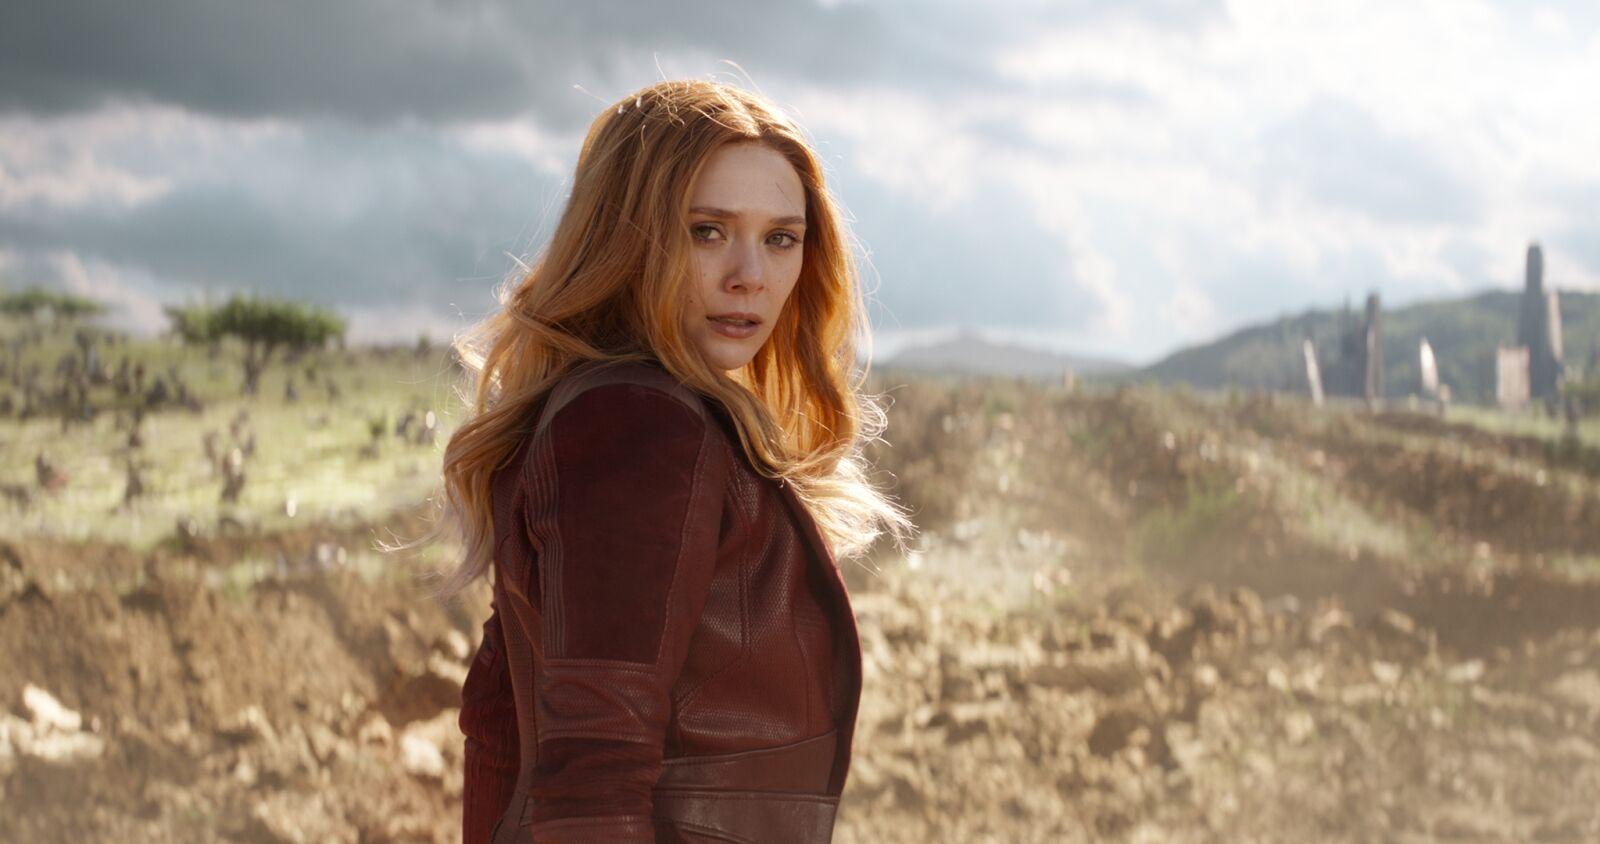 Elizabeth Olsen: WandaVision satisfy fans of the MCU and Marvel Comics